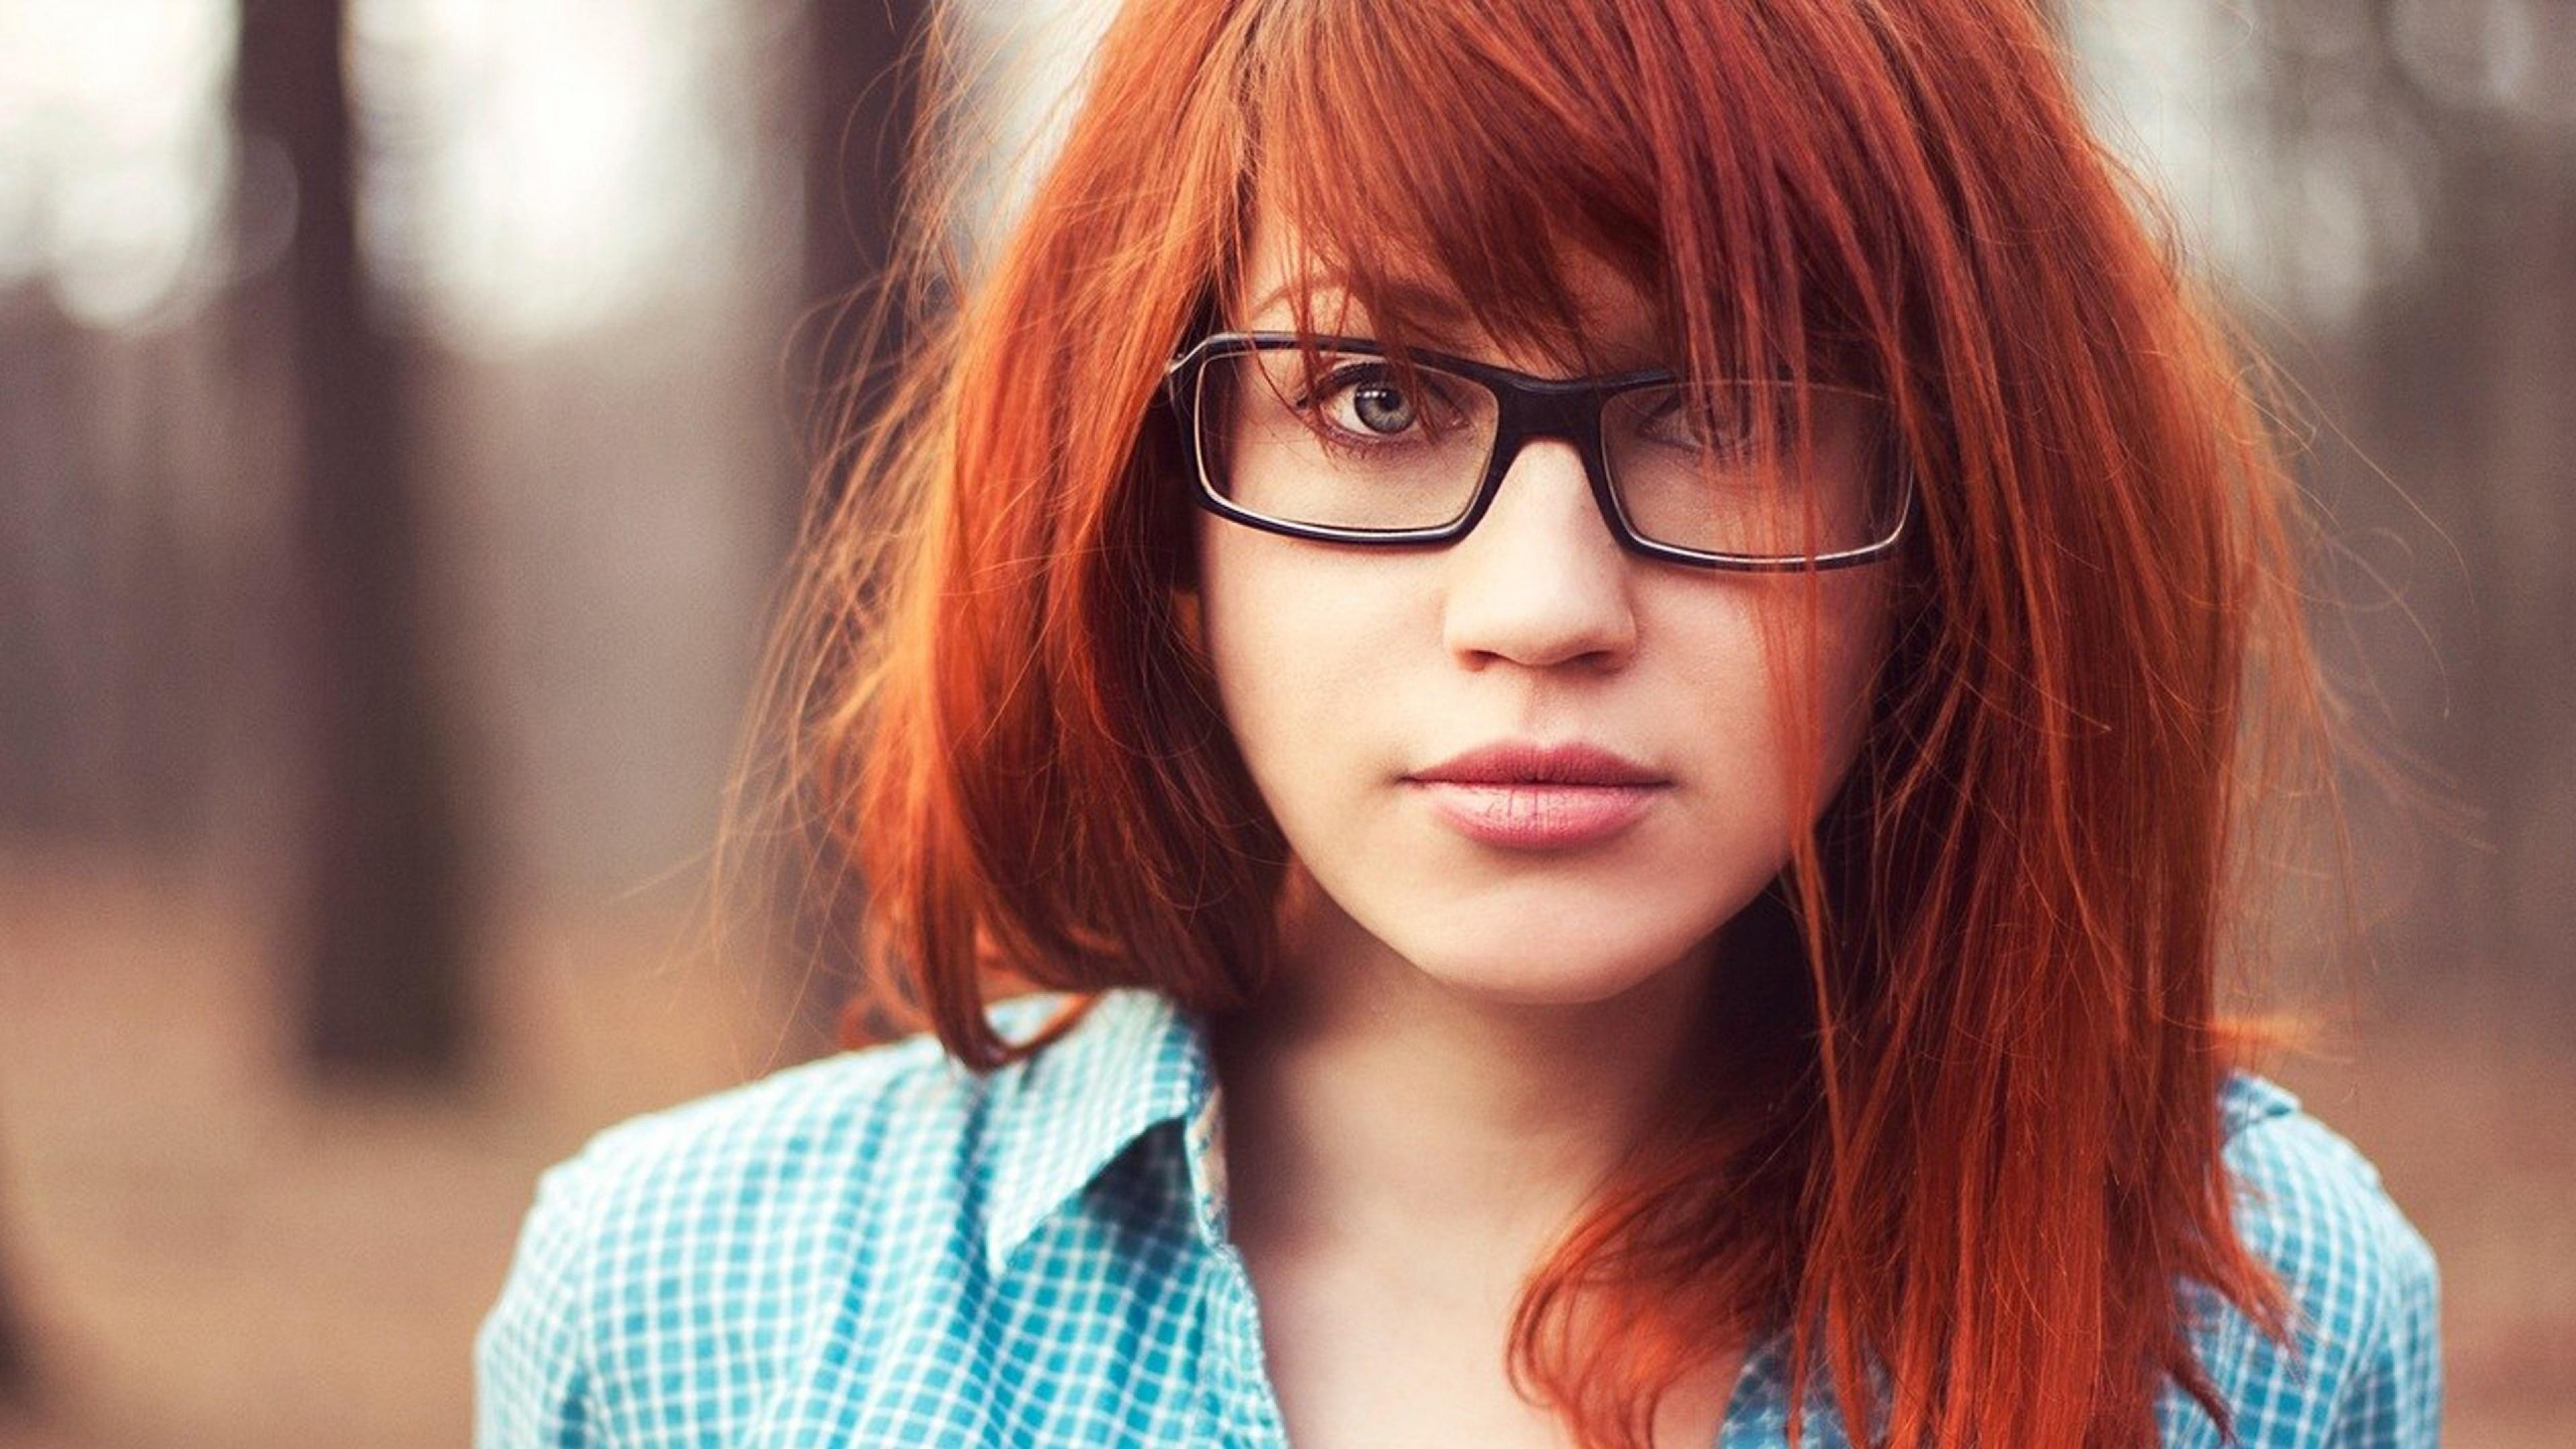 3840x2160 Wallpaper girl, redhead, glasses, autumn, mood, shirt